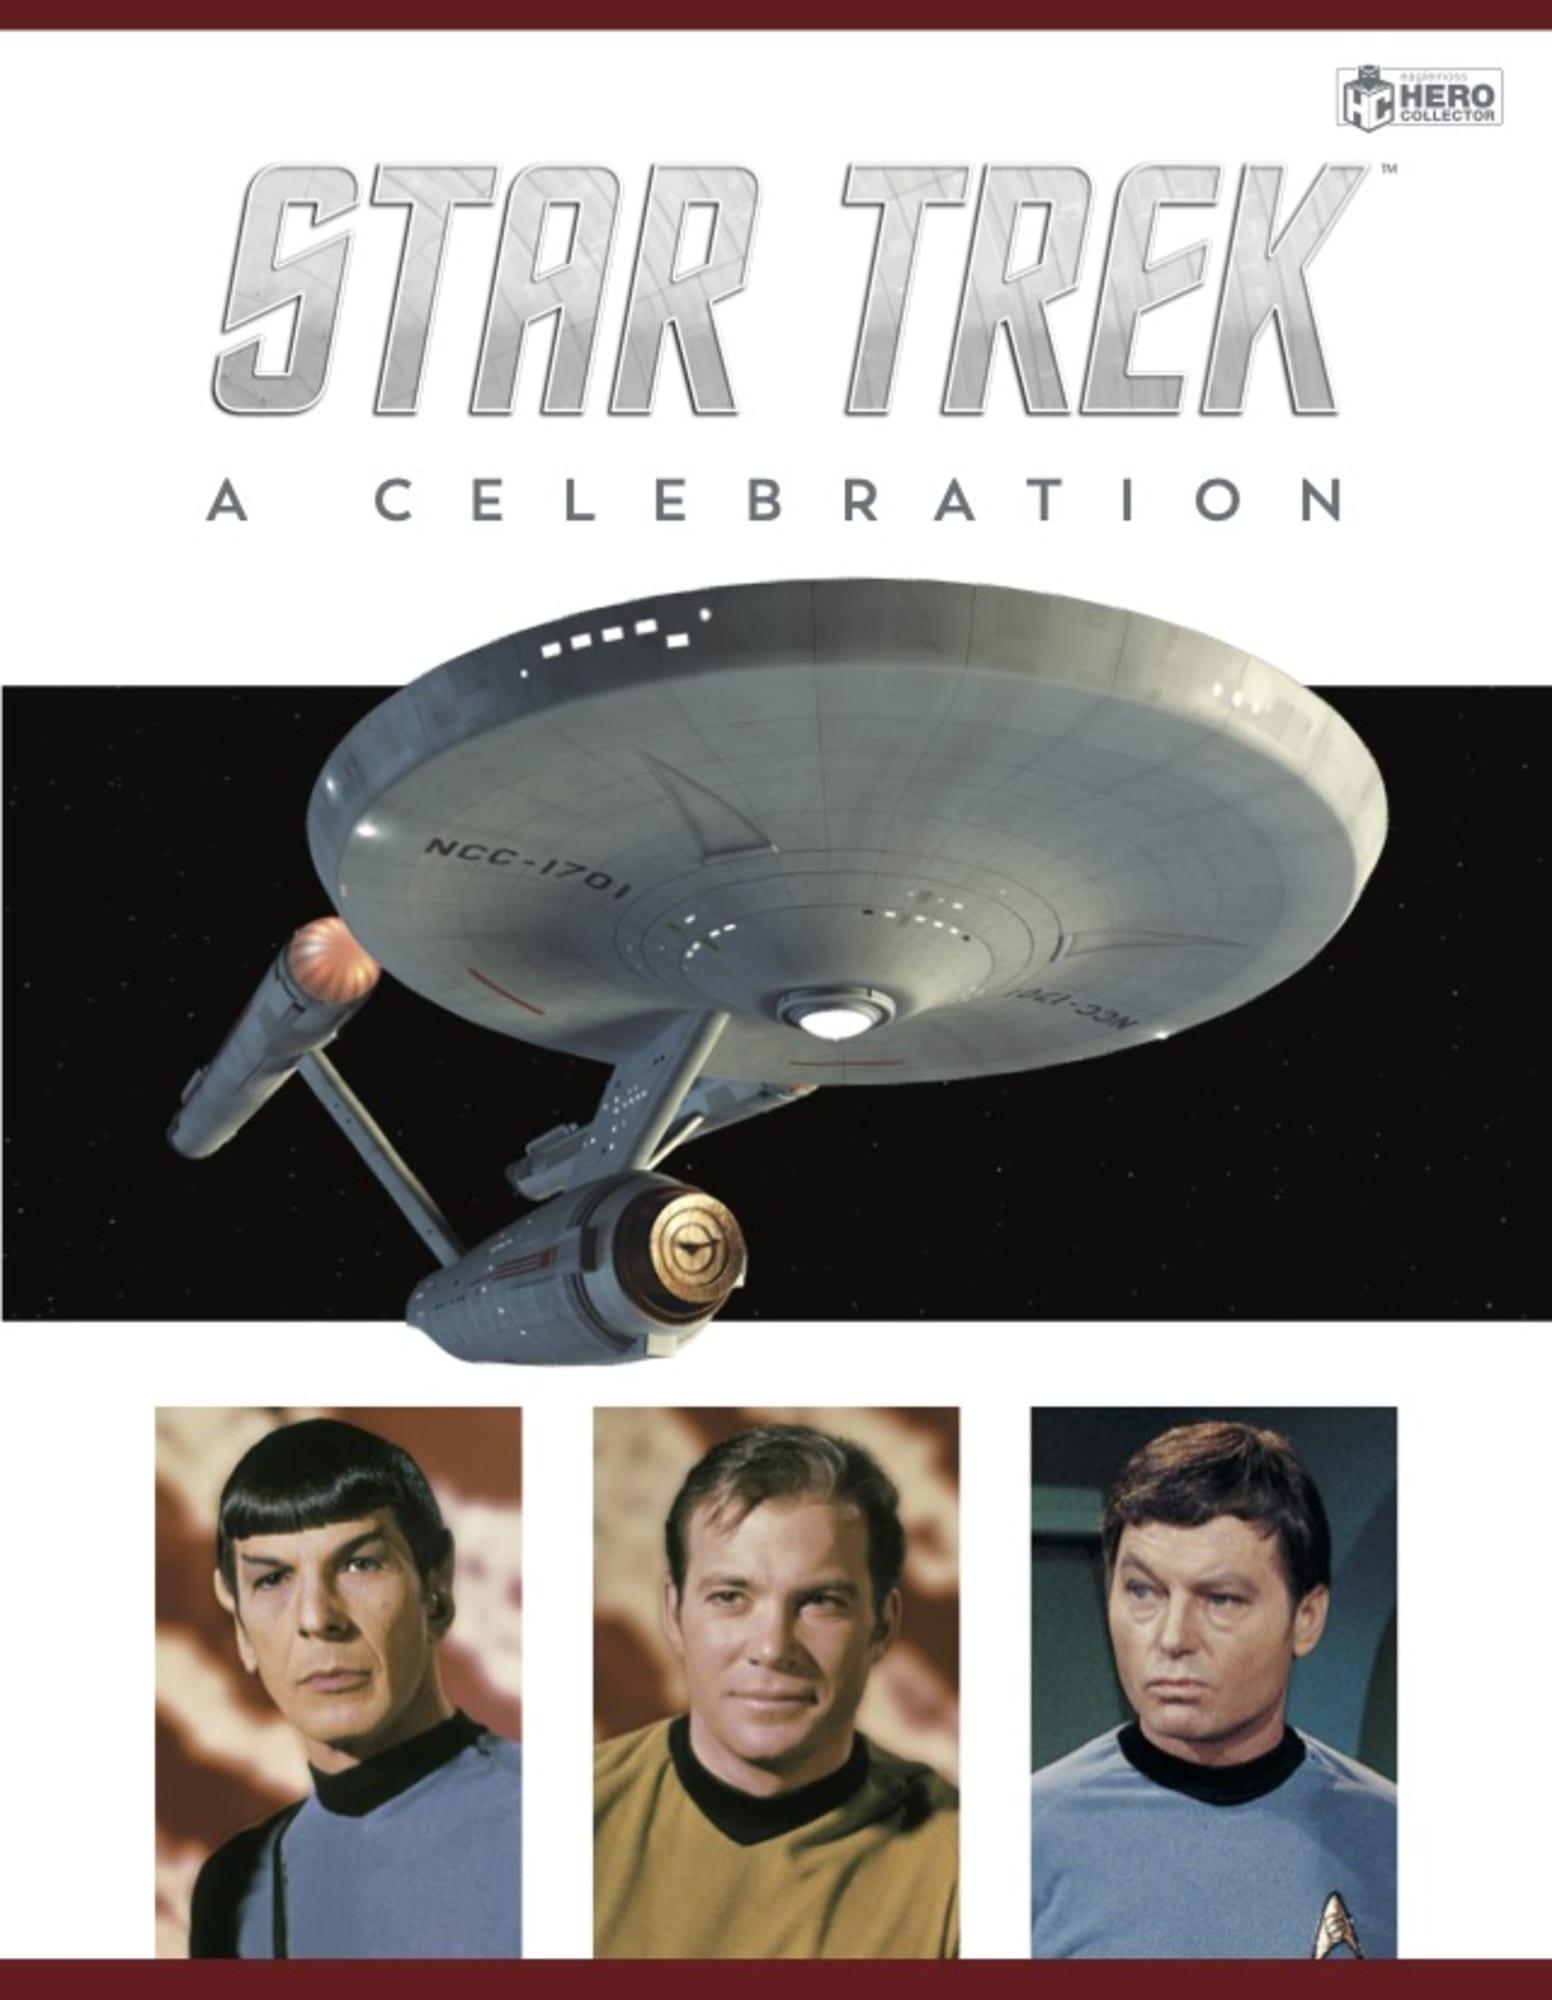 Air Force Academy used Star Trek to study leadership